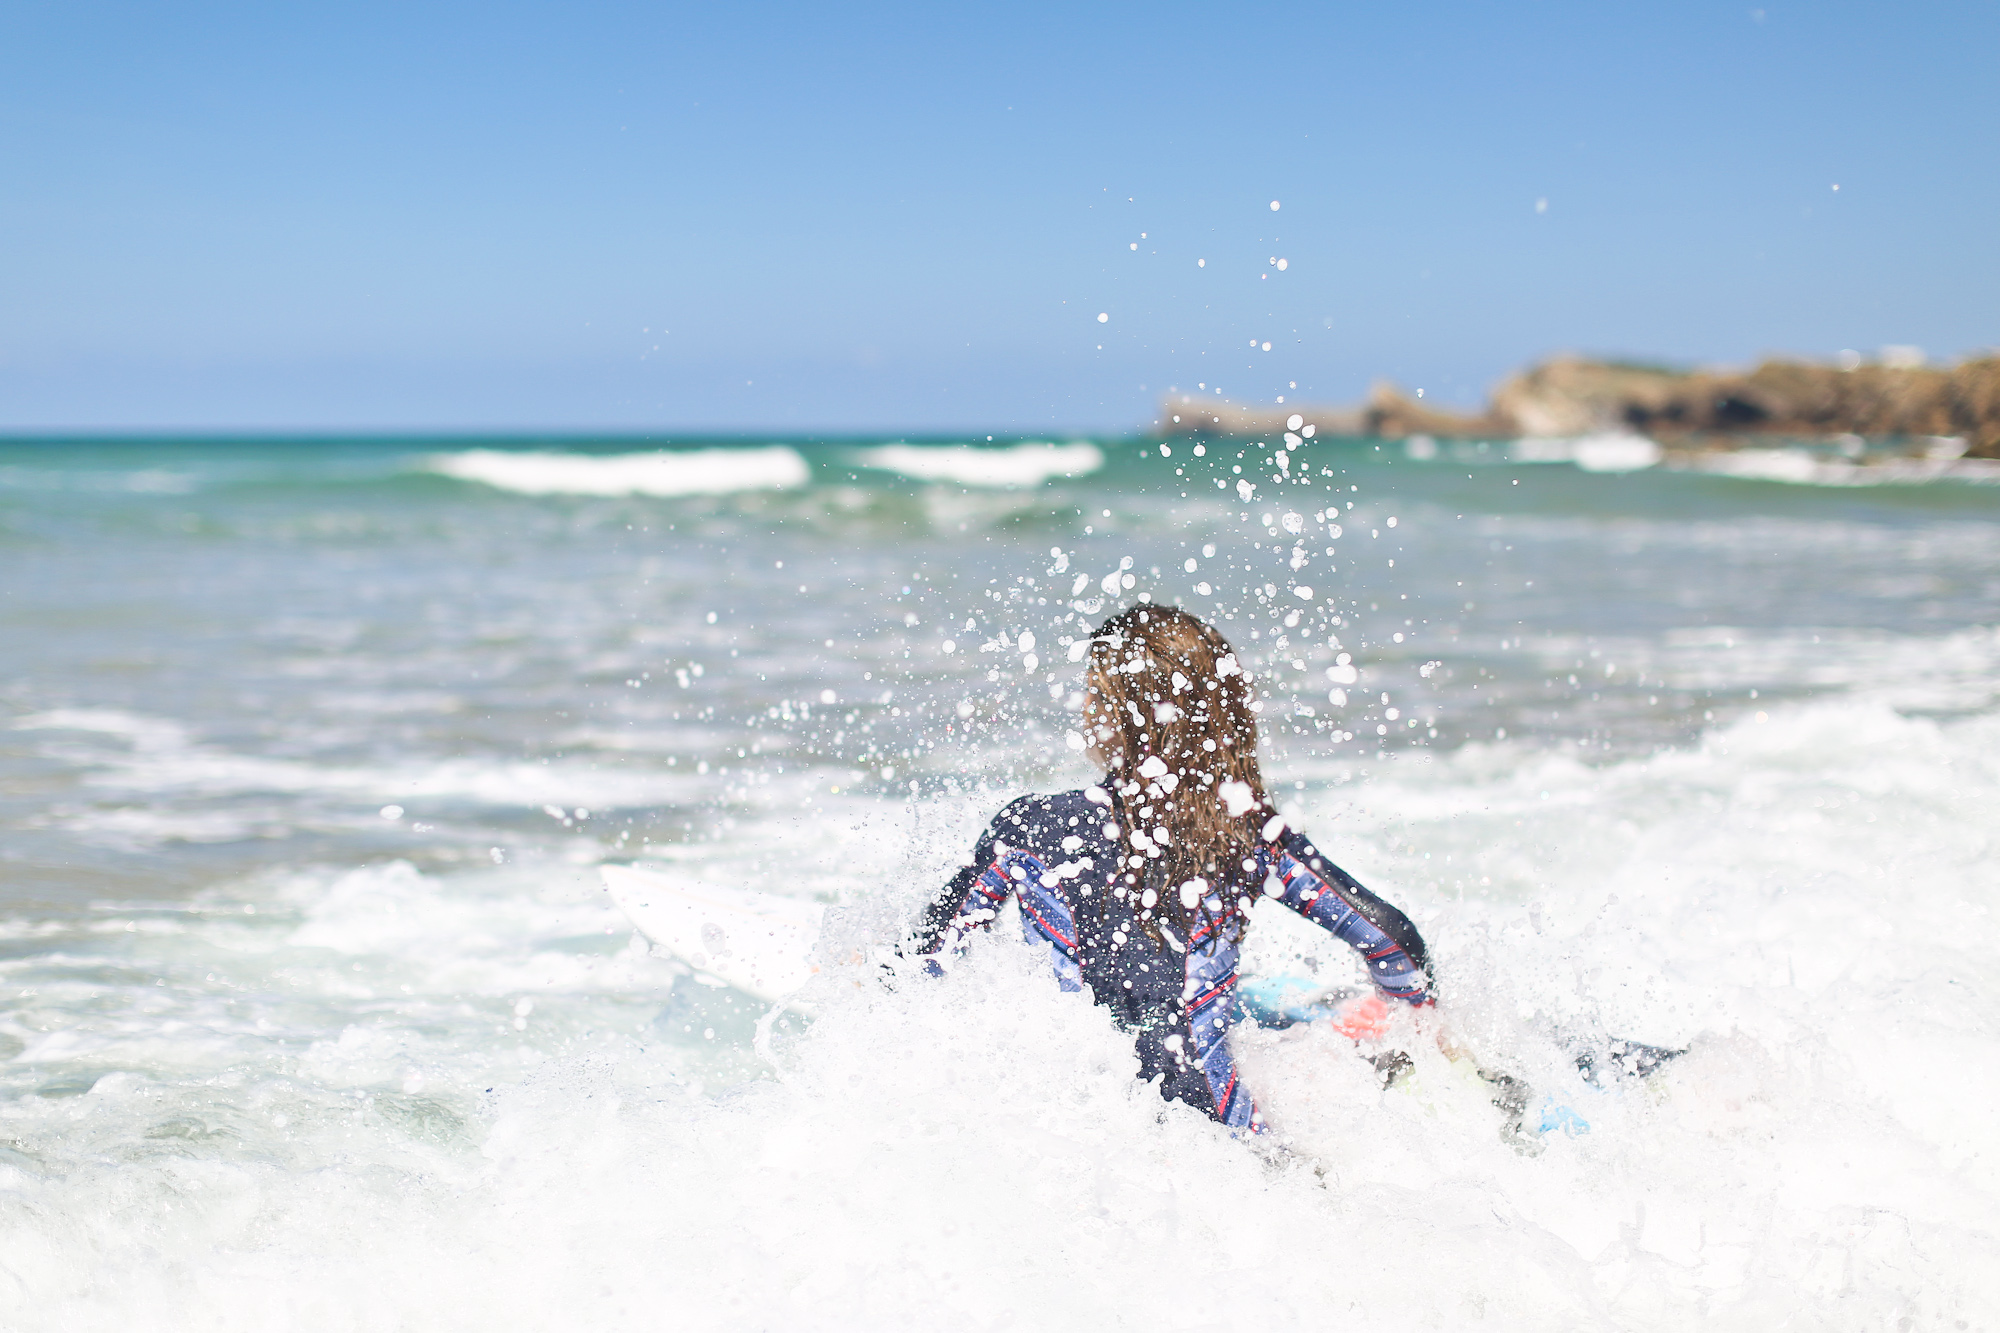 Clochet_surf_rip_curl_bombshell_wetsuit_7